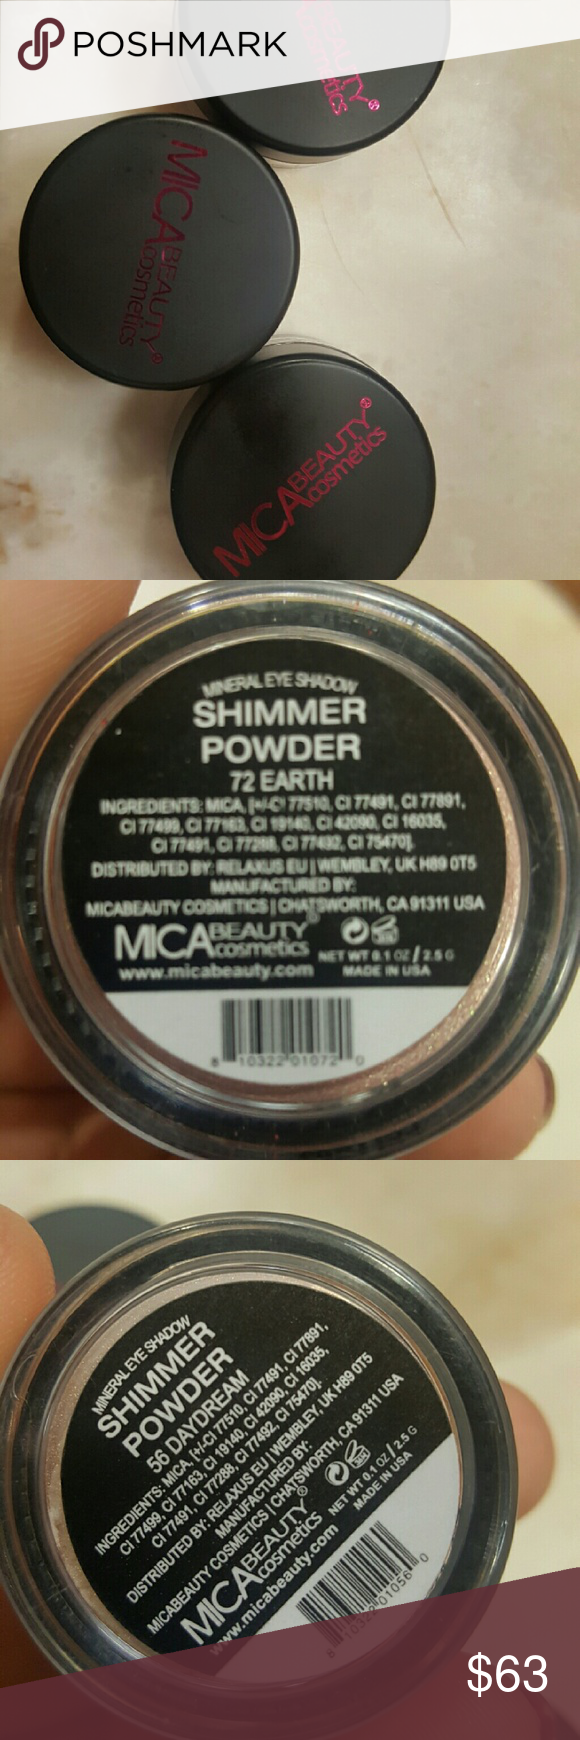 Mica Cosmetics Mica cosmetics, Loose powder, Cosmetics